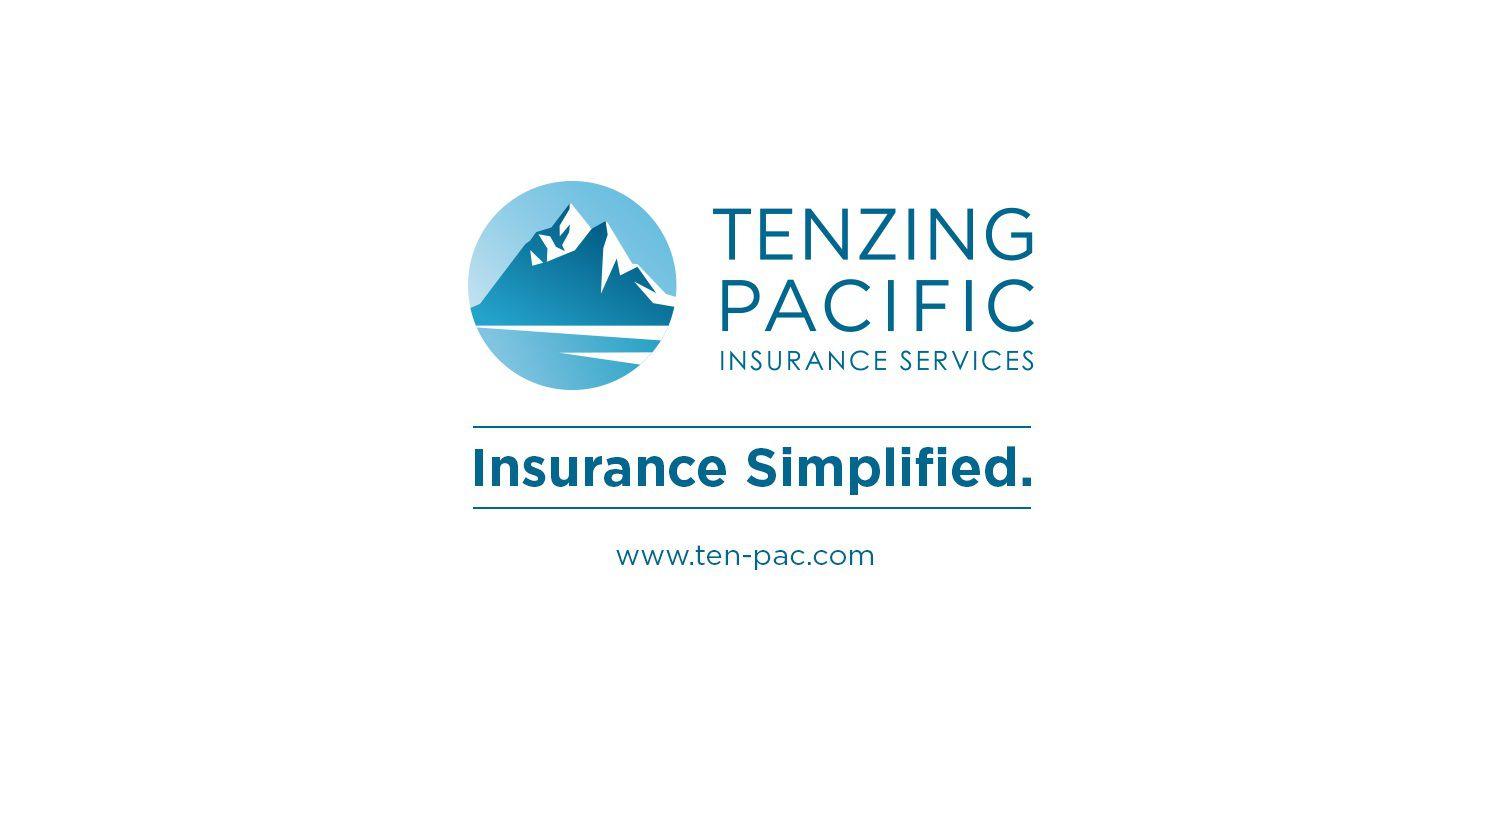 Tenzing Pacific logo